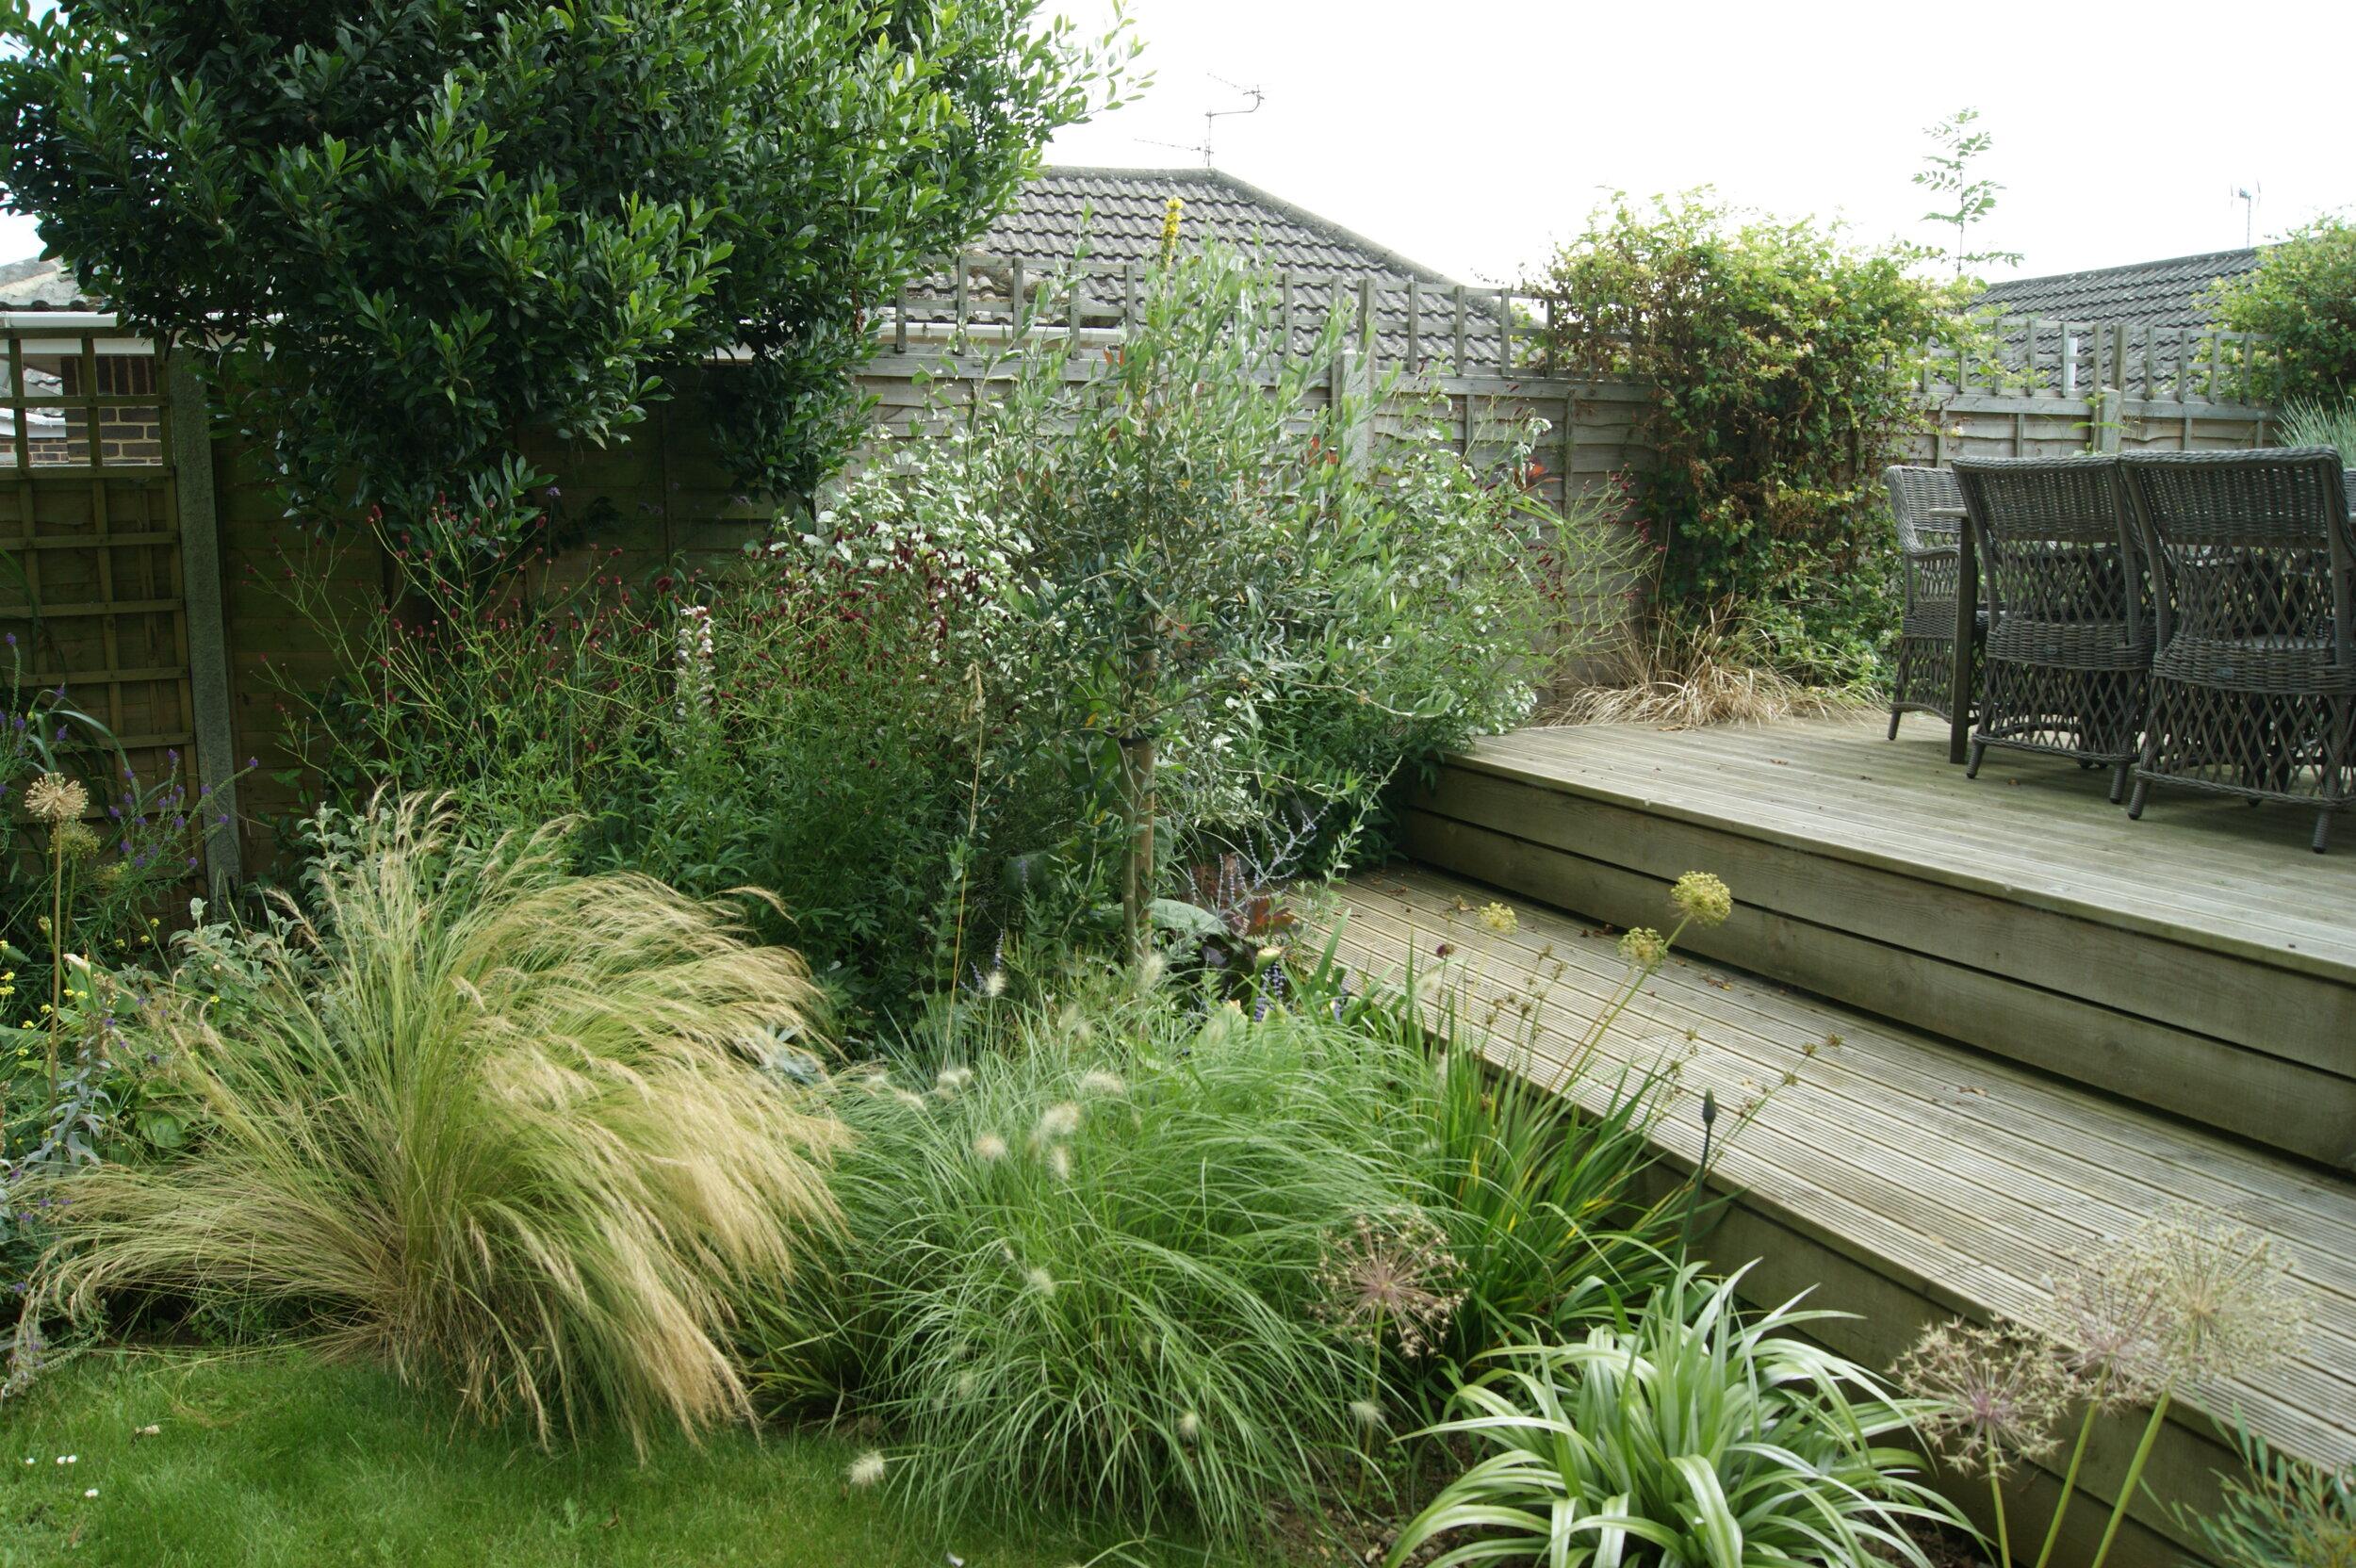 Bembridge Romantic Garden Garden Design On The Isle Of Wight By Janet Beckett Beckett Gardens